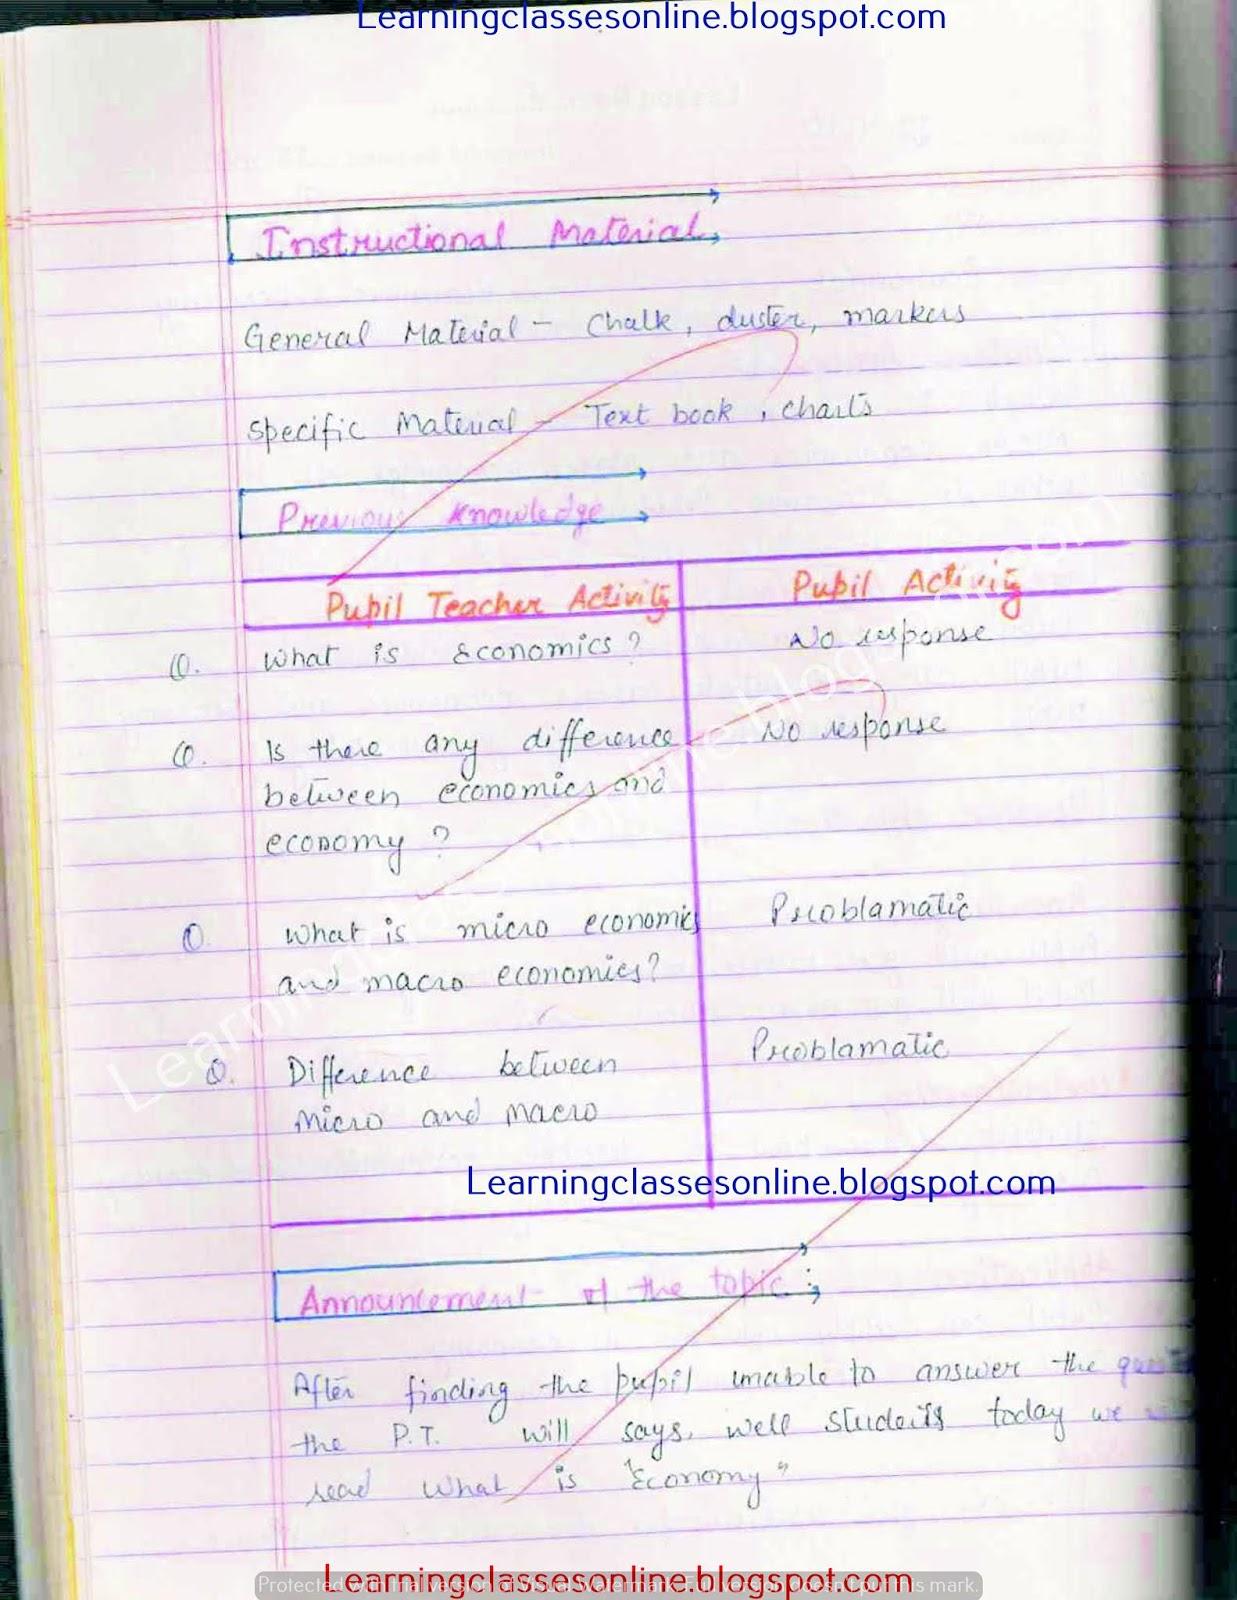 BEd lesson plan for economics teachers of 12